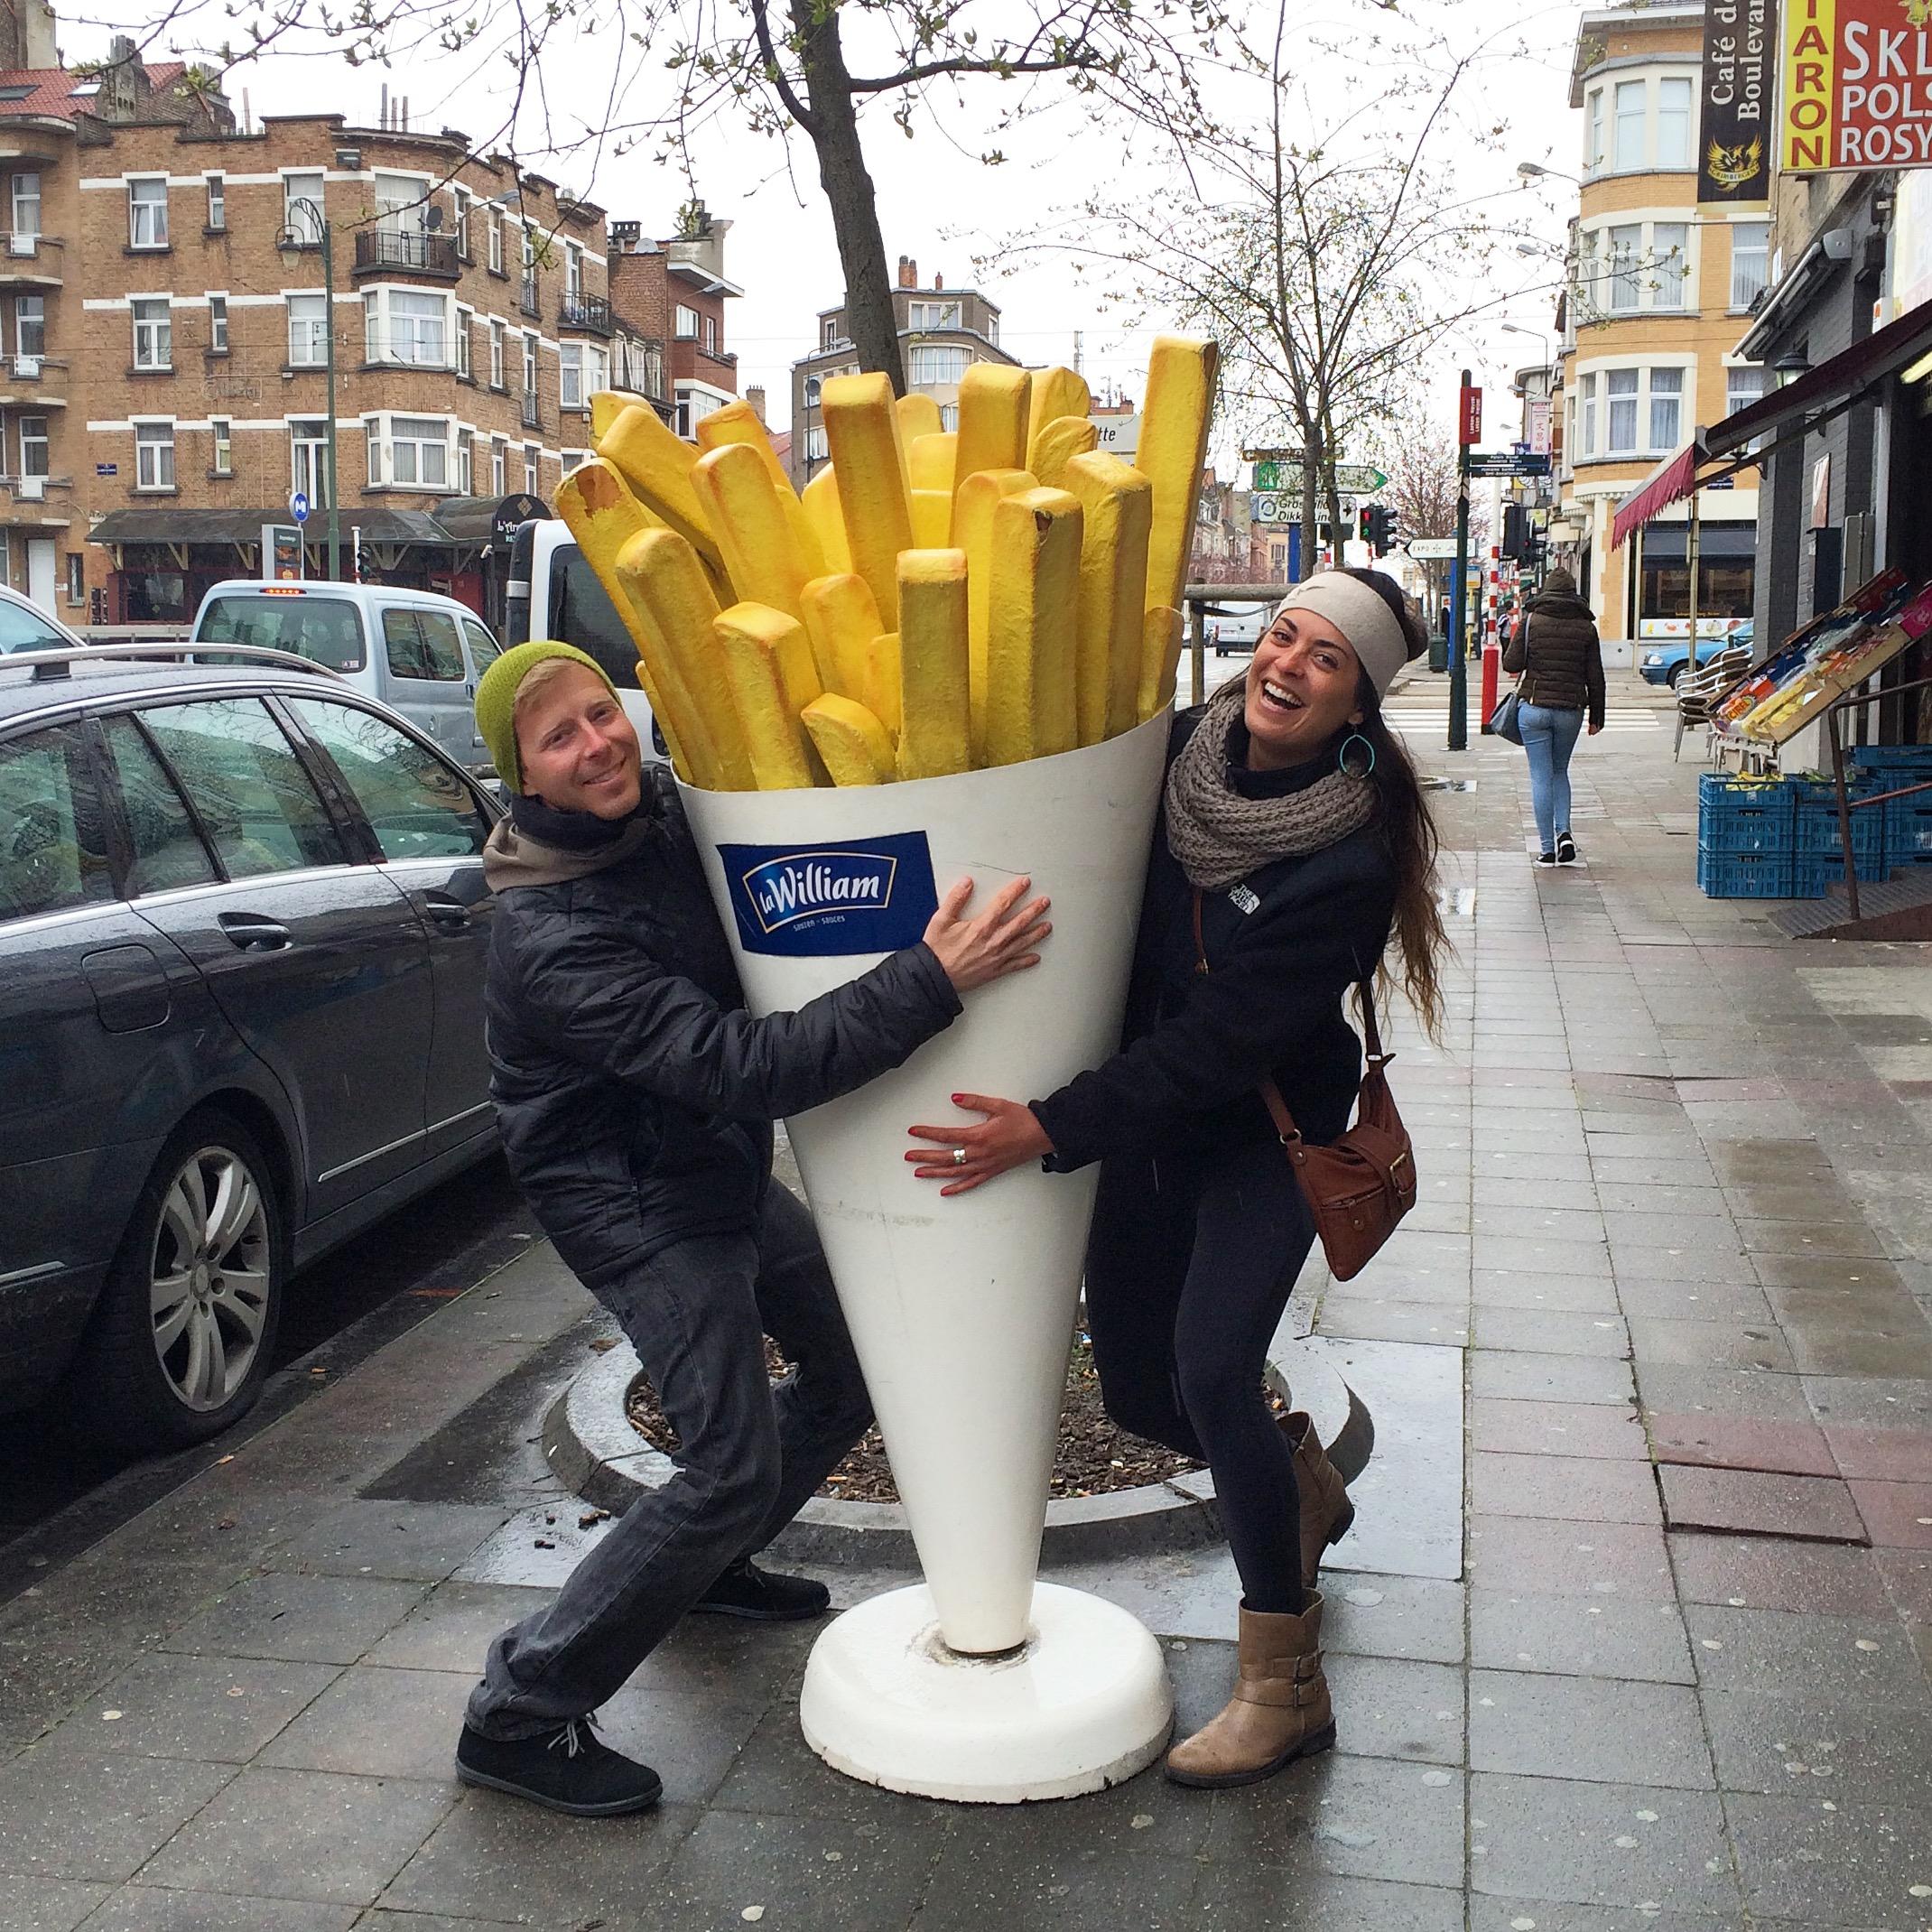 Gettin' down on the Belgian  pommes frites .